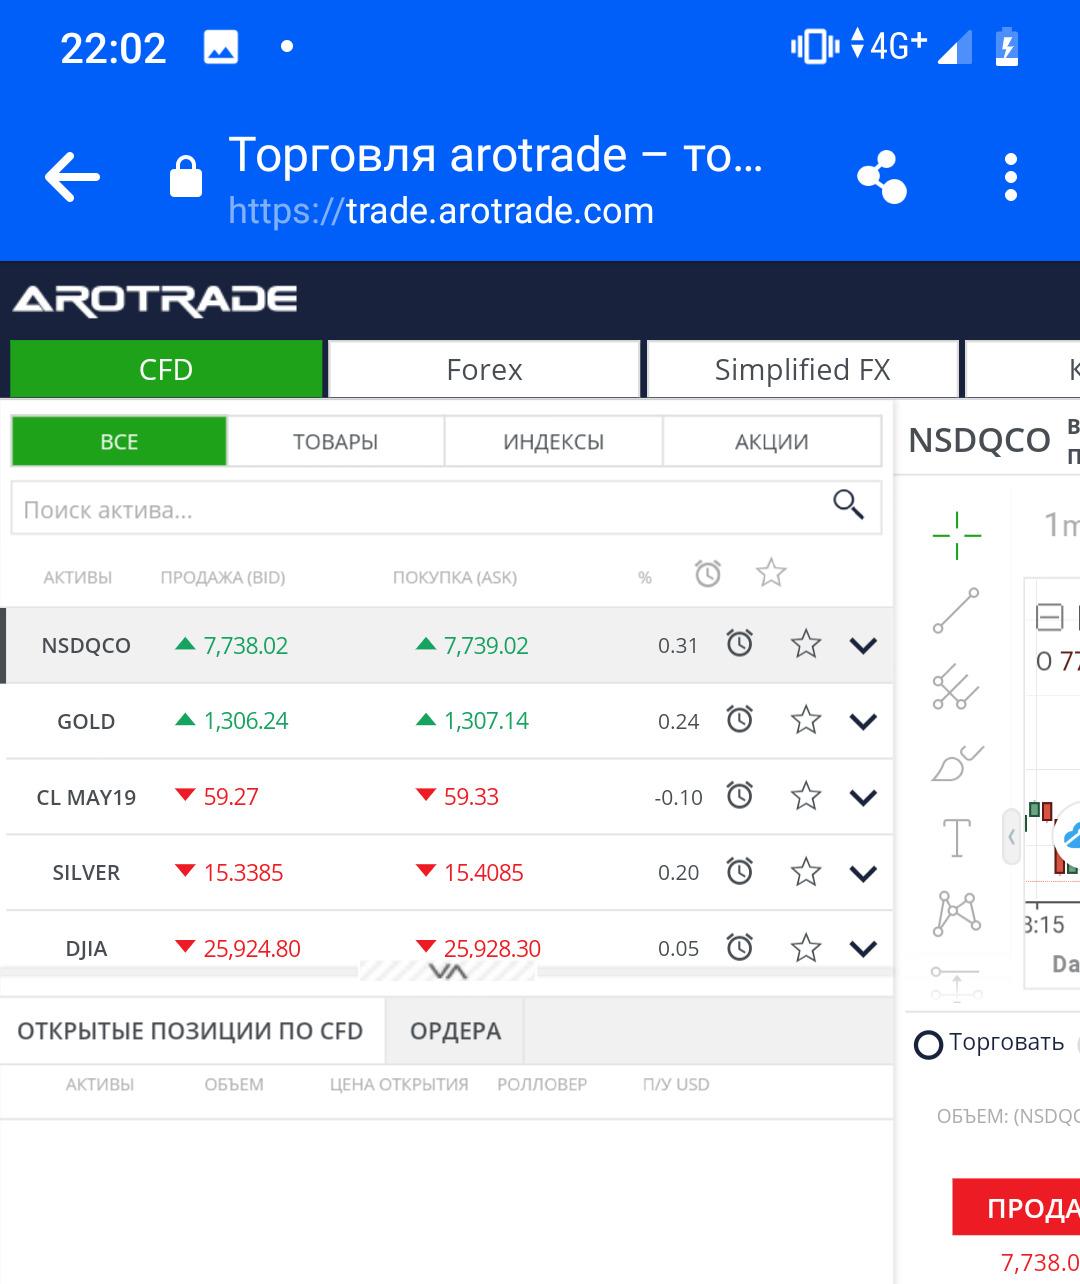 694197_skrinshot_torgovogo_terminala_dc_